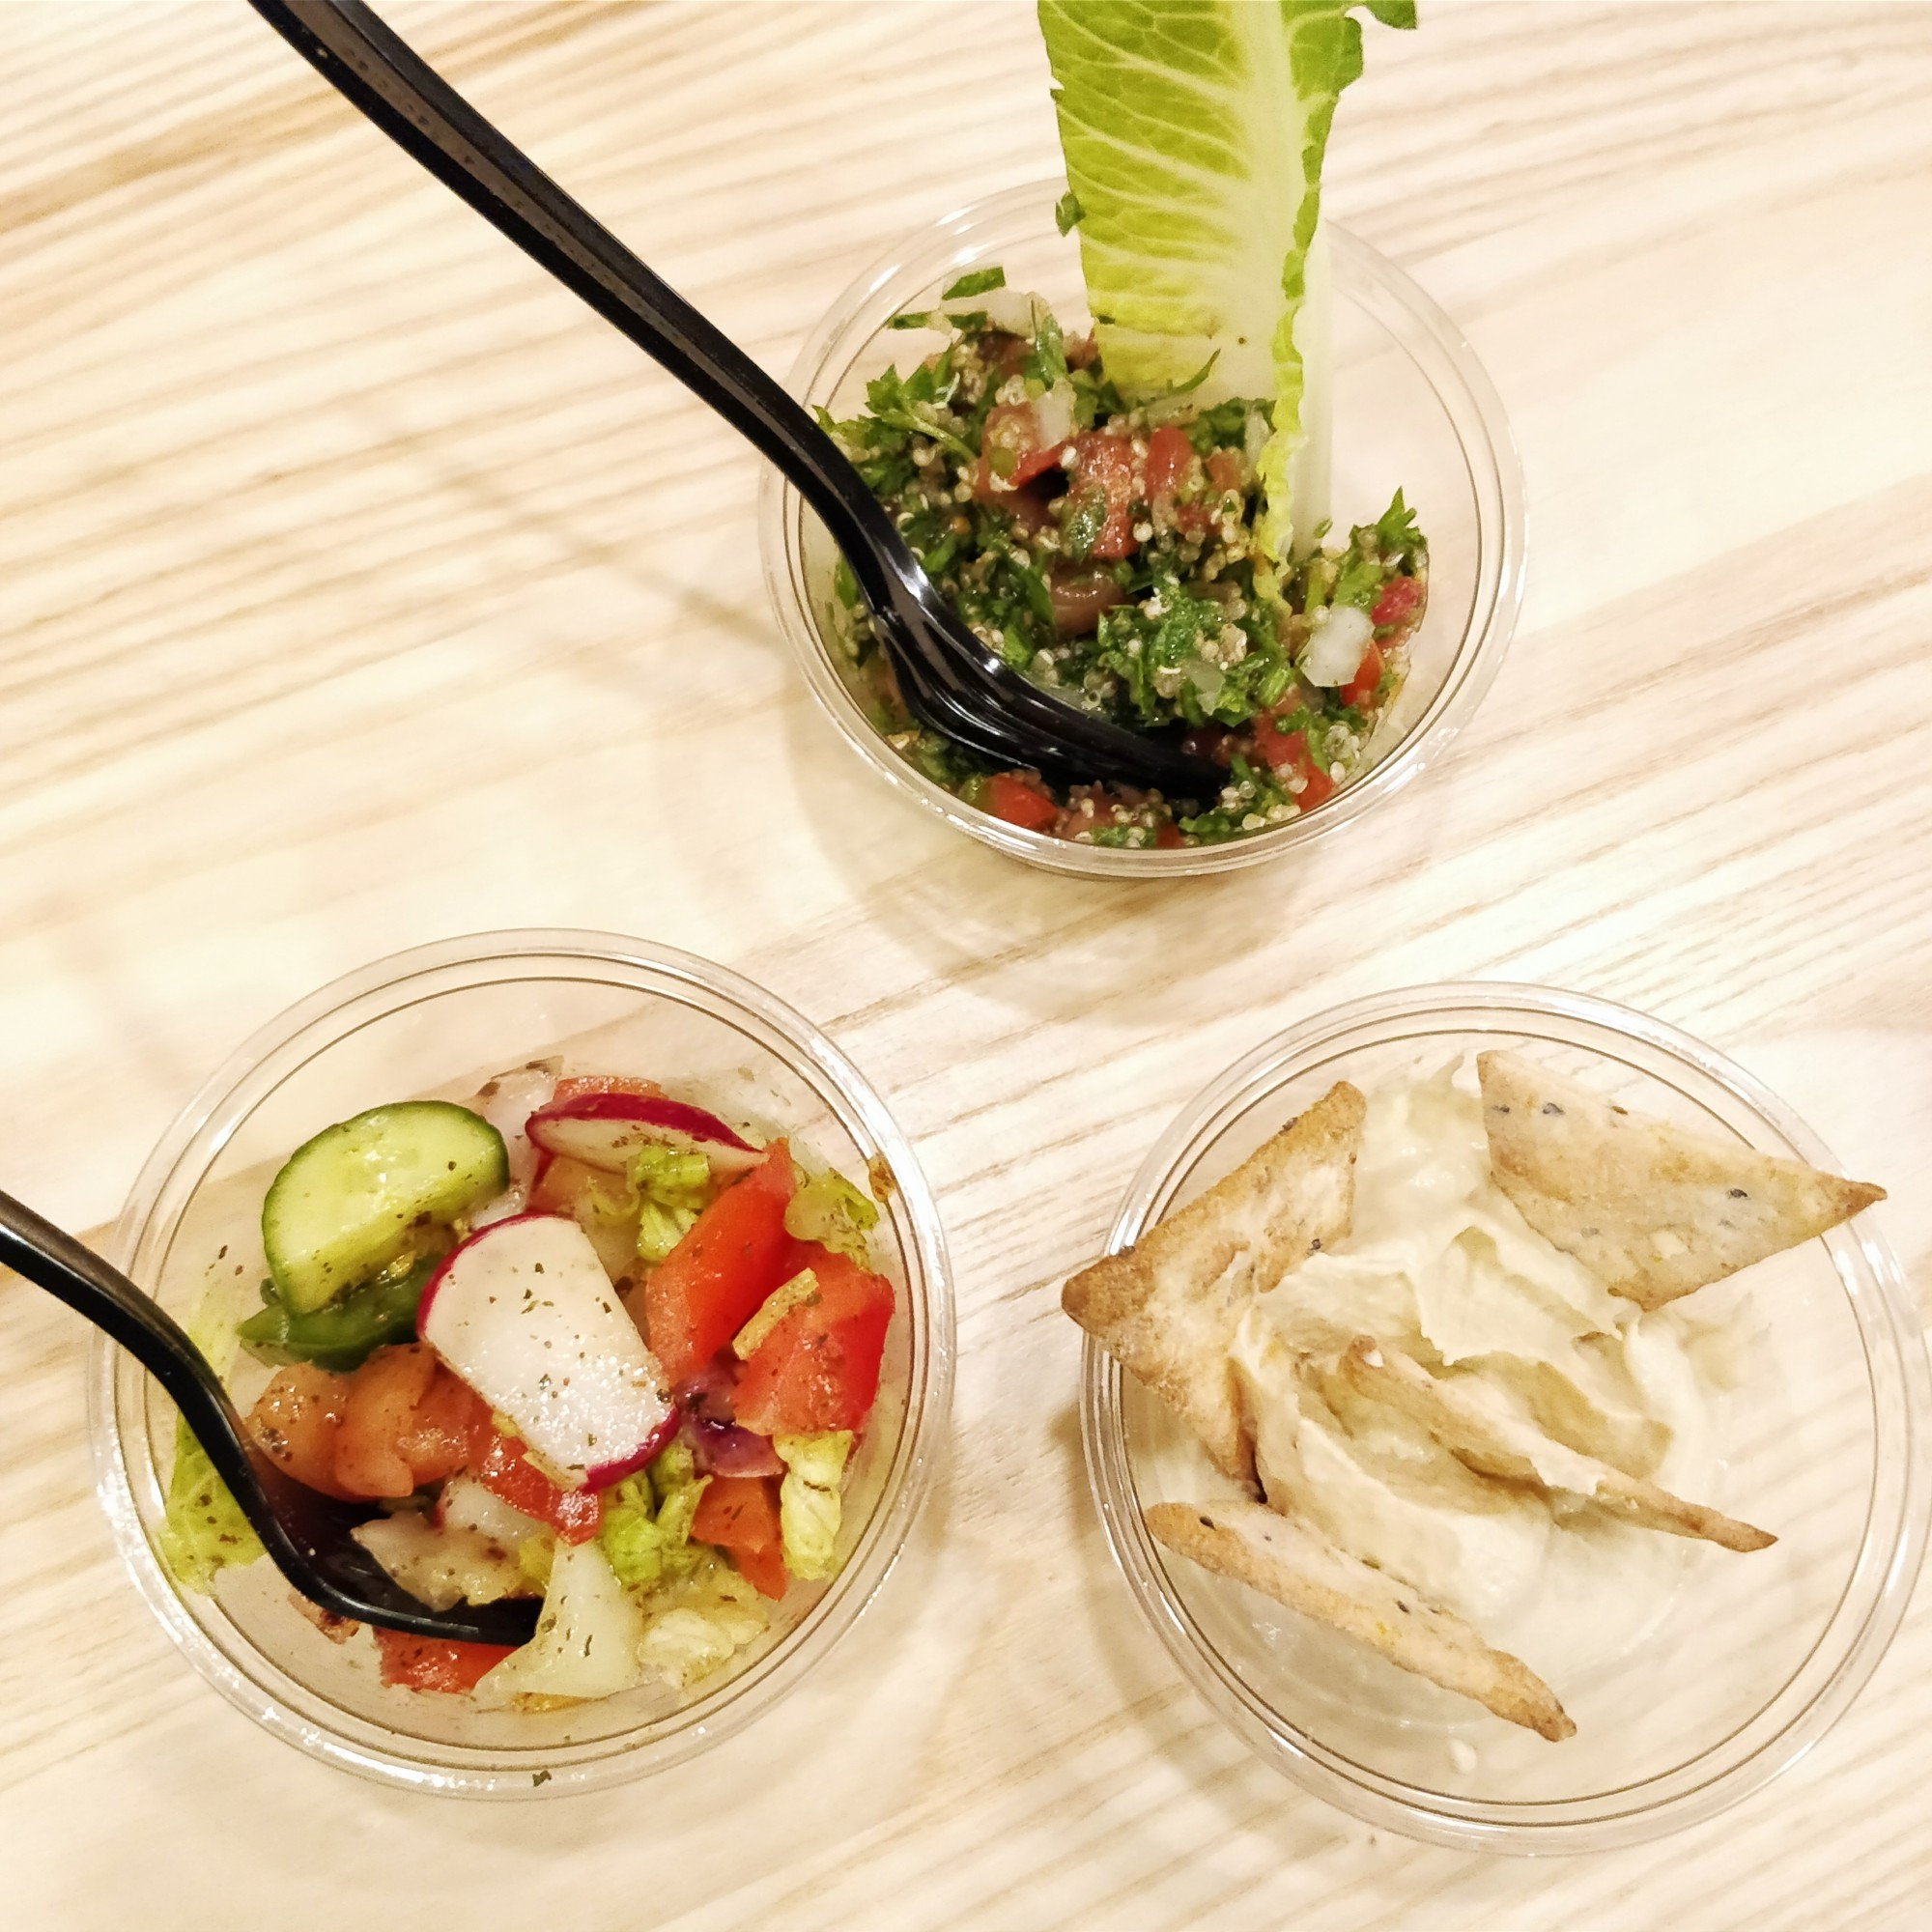 jouney-fattoush-tabbouleh-hummus